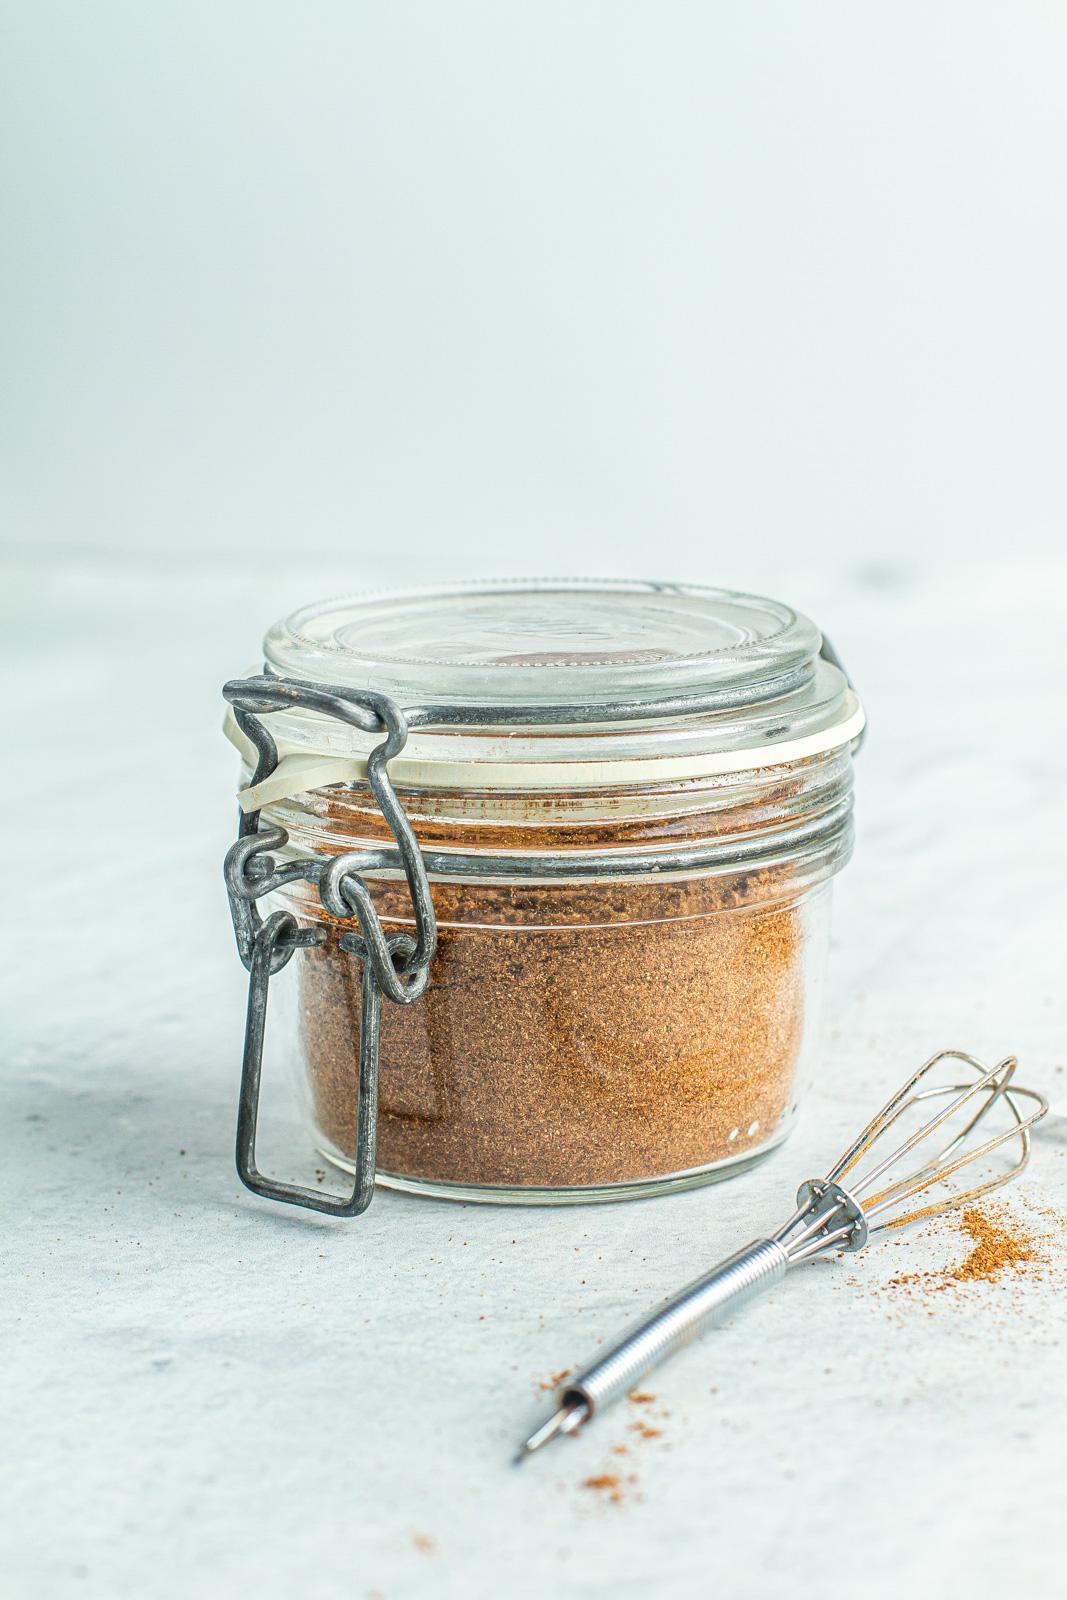 homemade pumpkin spice in a airtight container